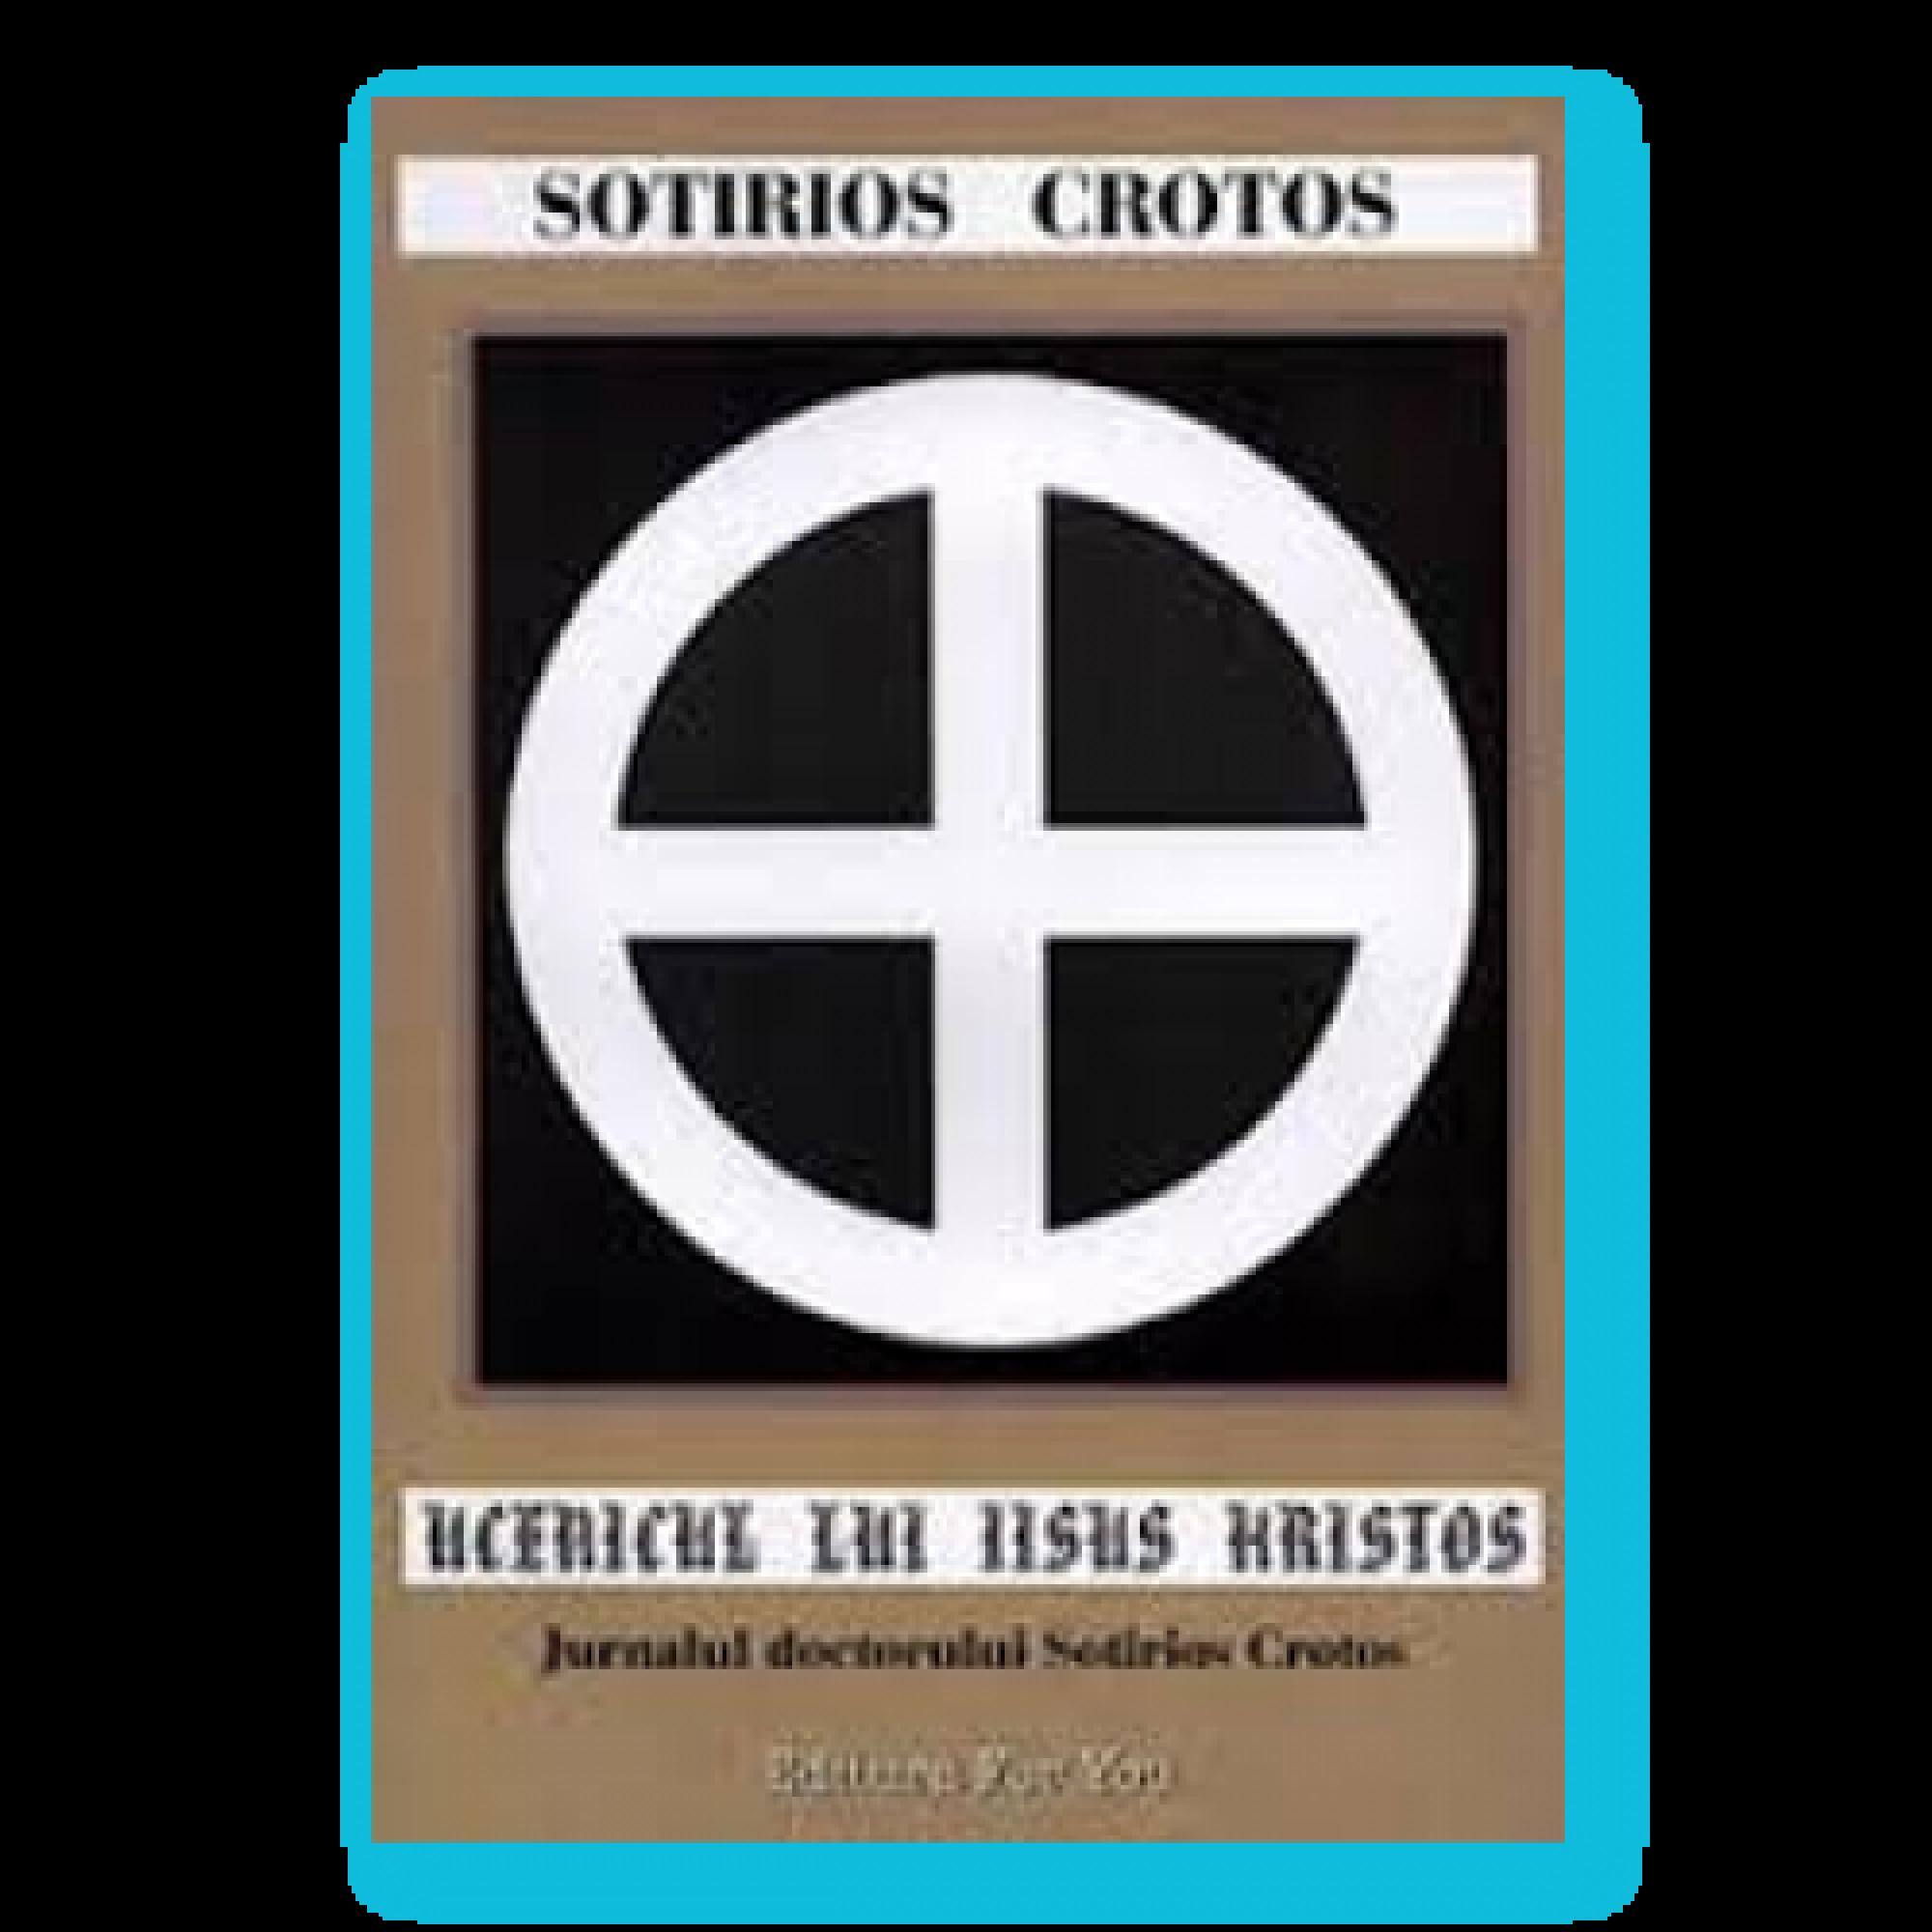 Ucenicul lui Iisus Hristos. Jurnalul doctorului Sotirios Crotos; Sotirios Crotos